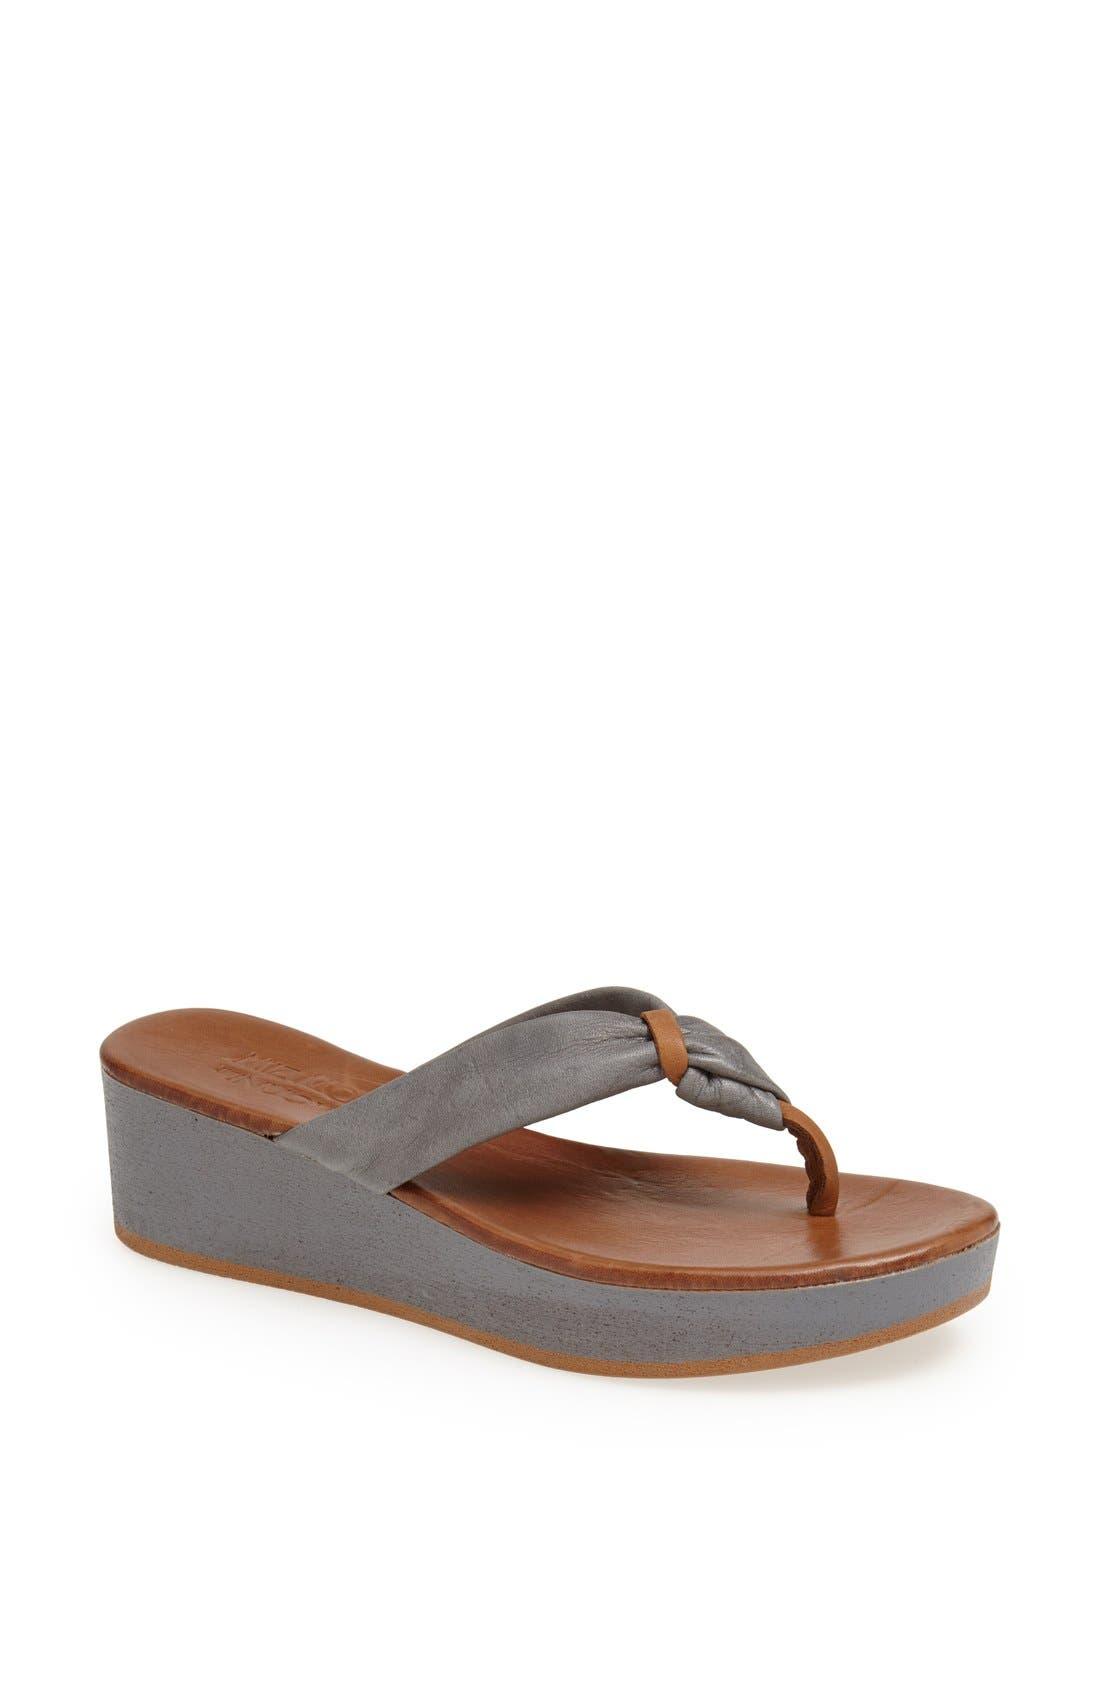 Alternate Image 1 Selected - Miz Mooz 'Belize' Leather Sandal